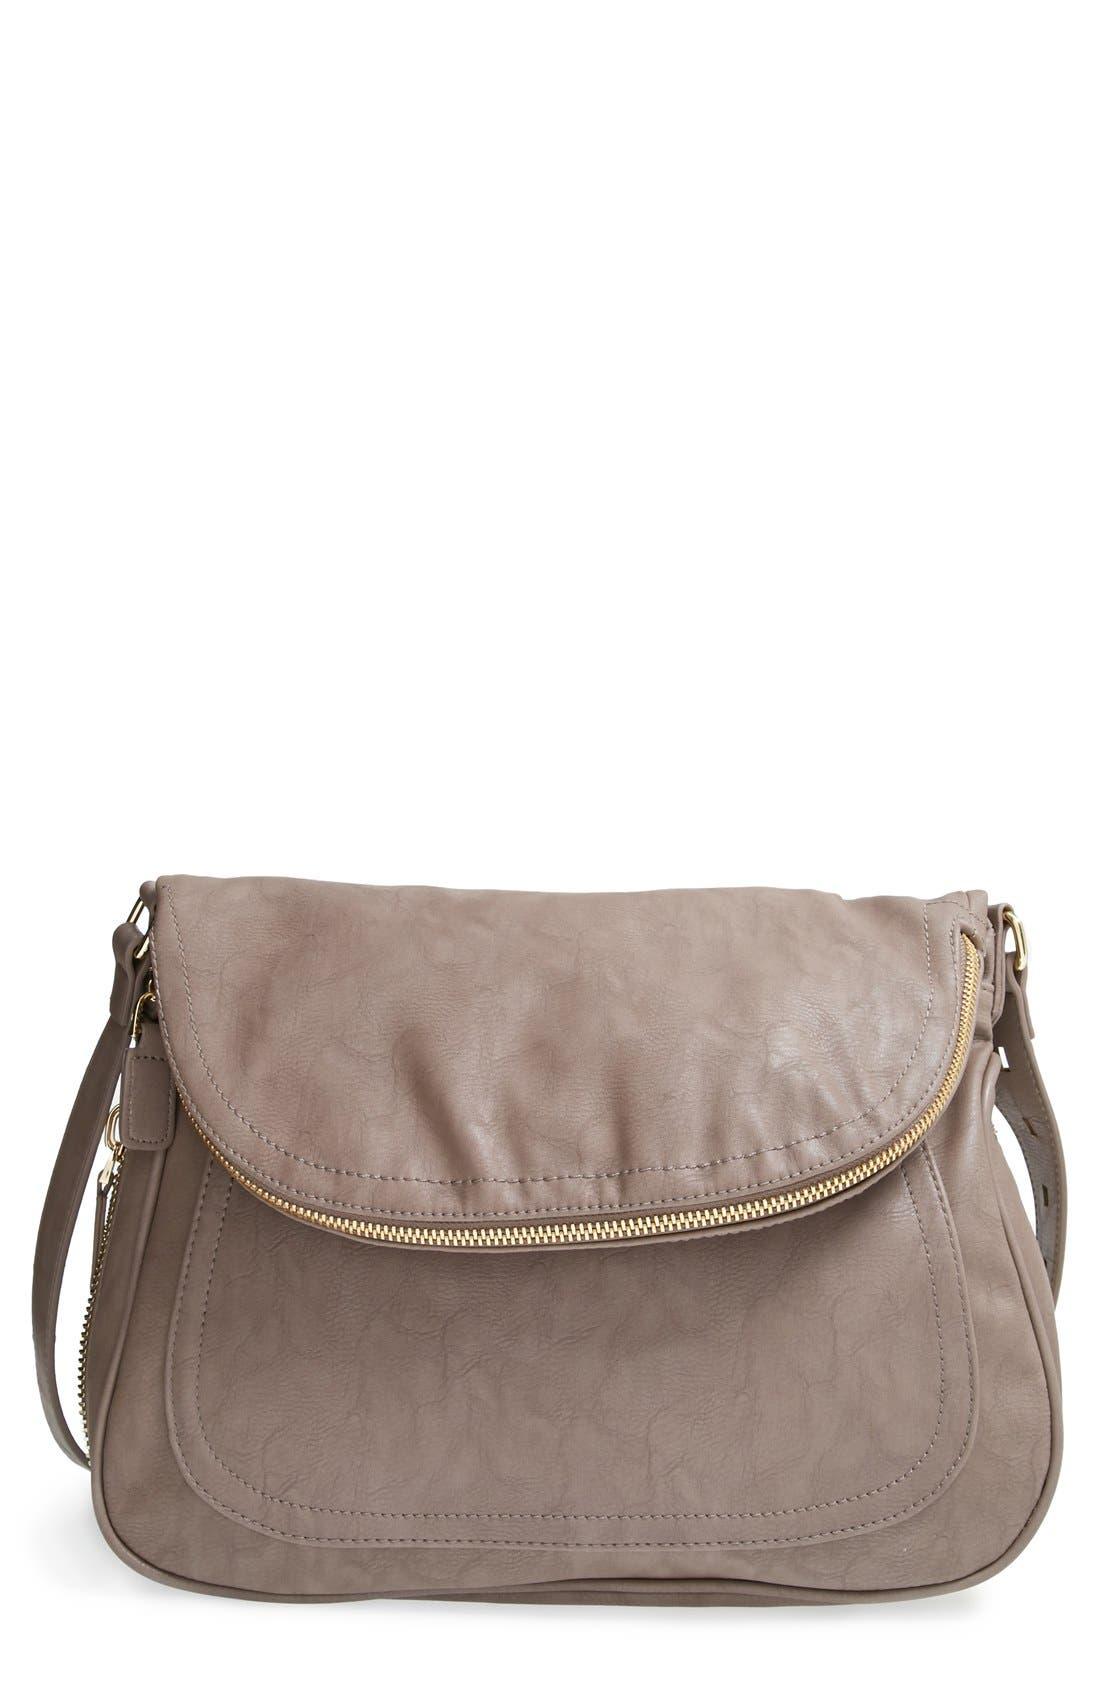 Main Image - Big Buddha 'Jarianna' Faux Leather Messenger Bag